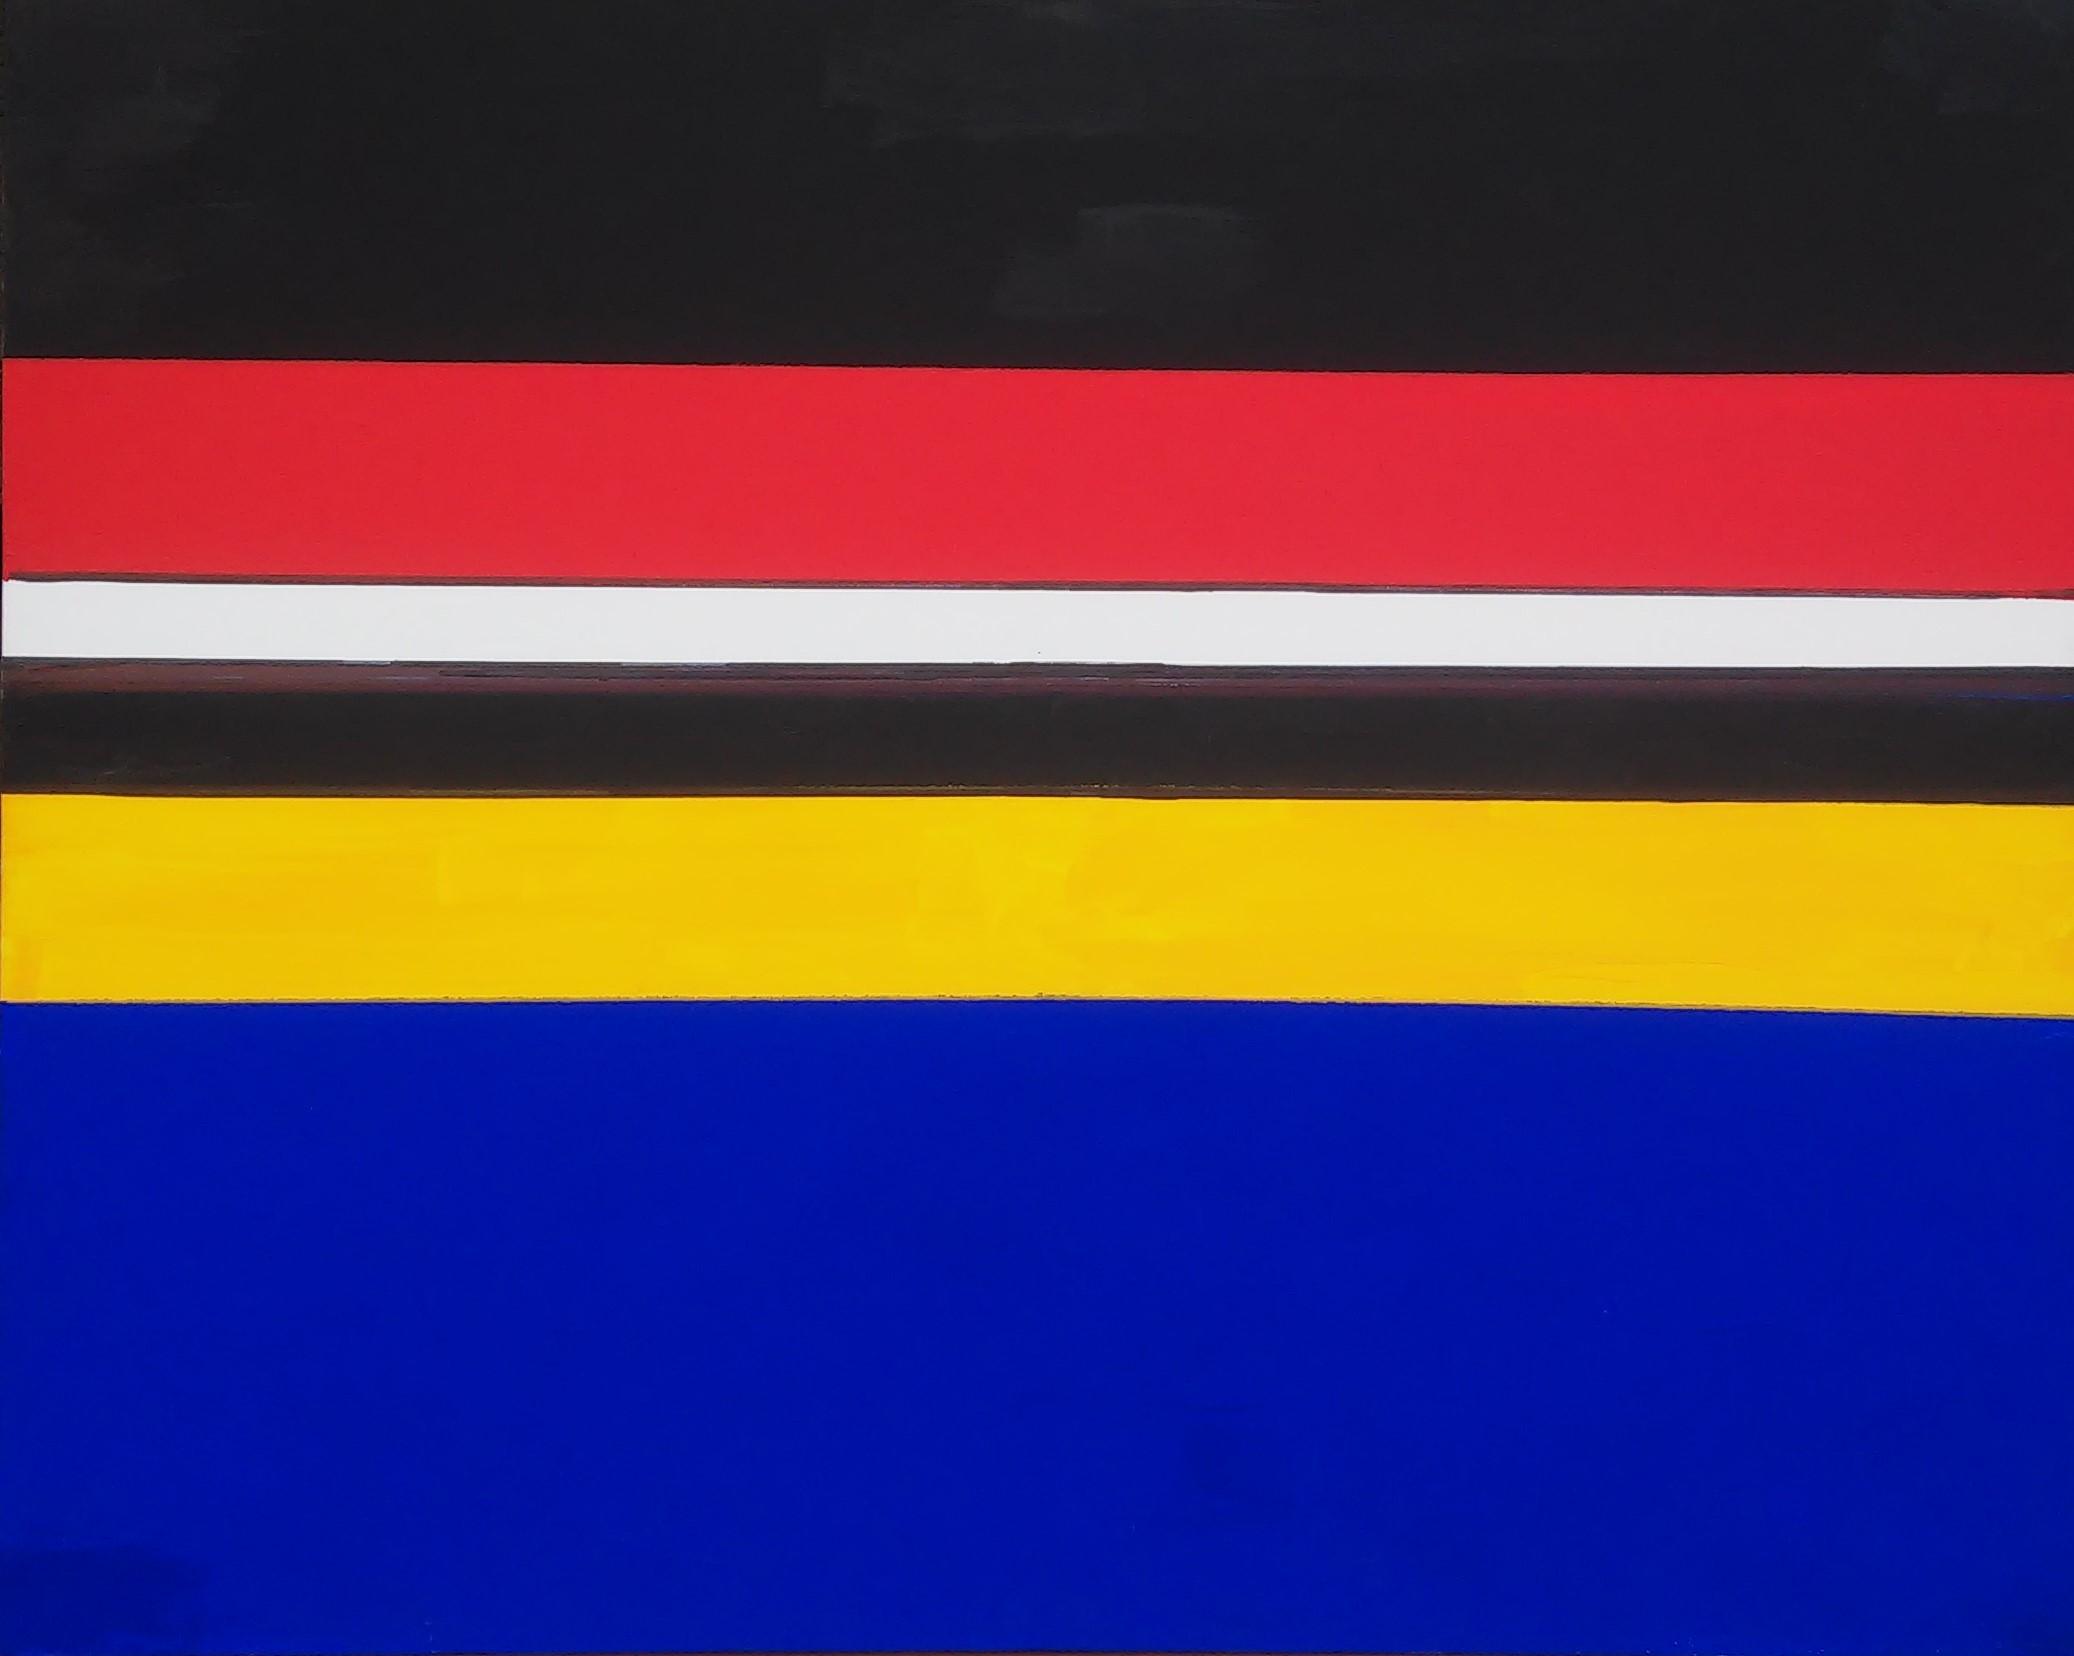 Sequenza plurima a memoria, 2017, acrilico su tela, cm. 80x100